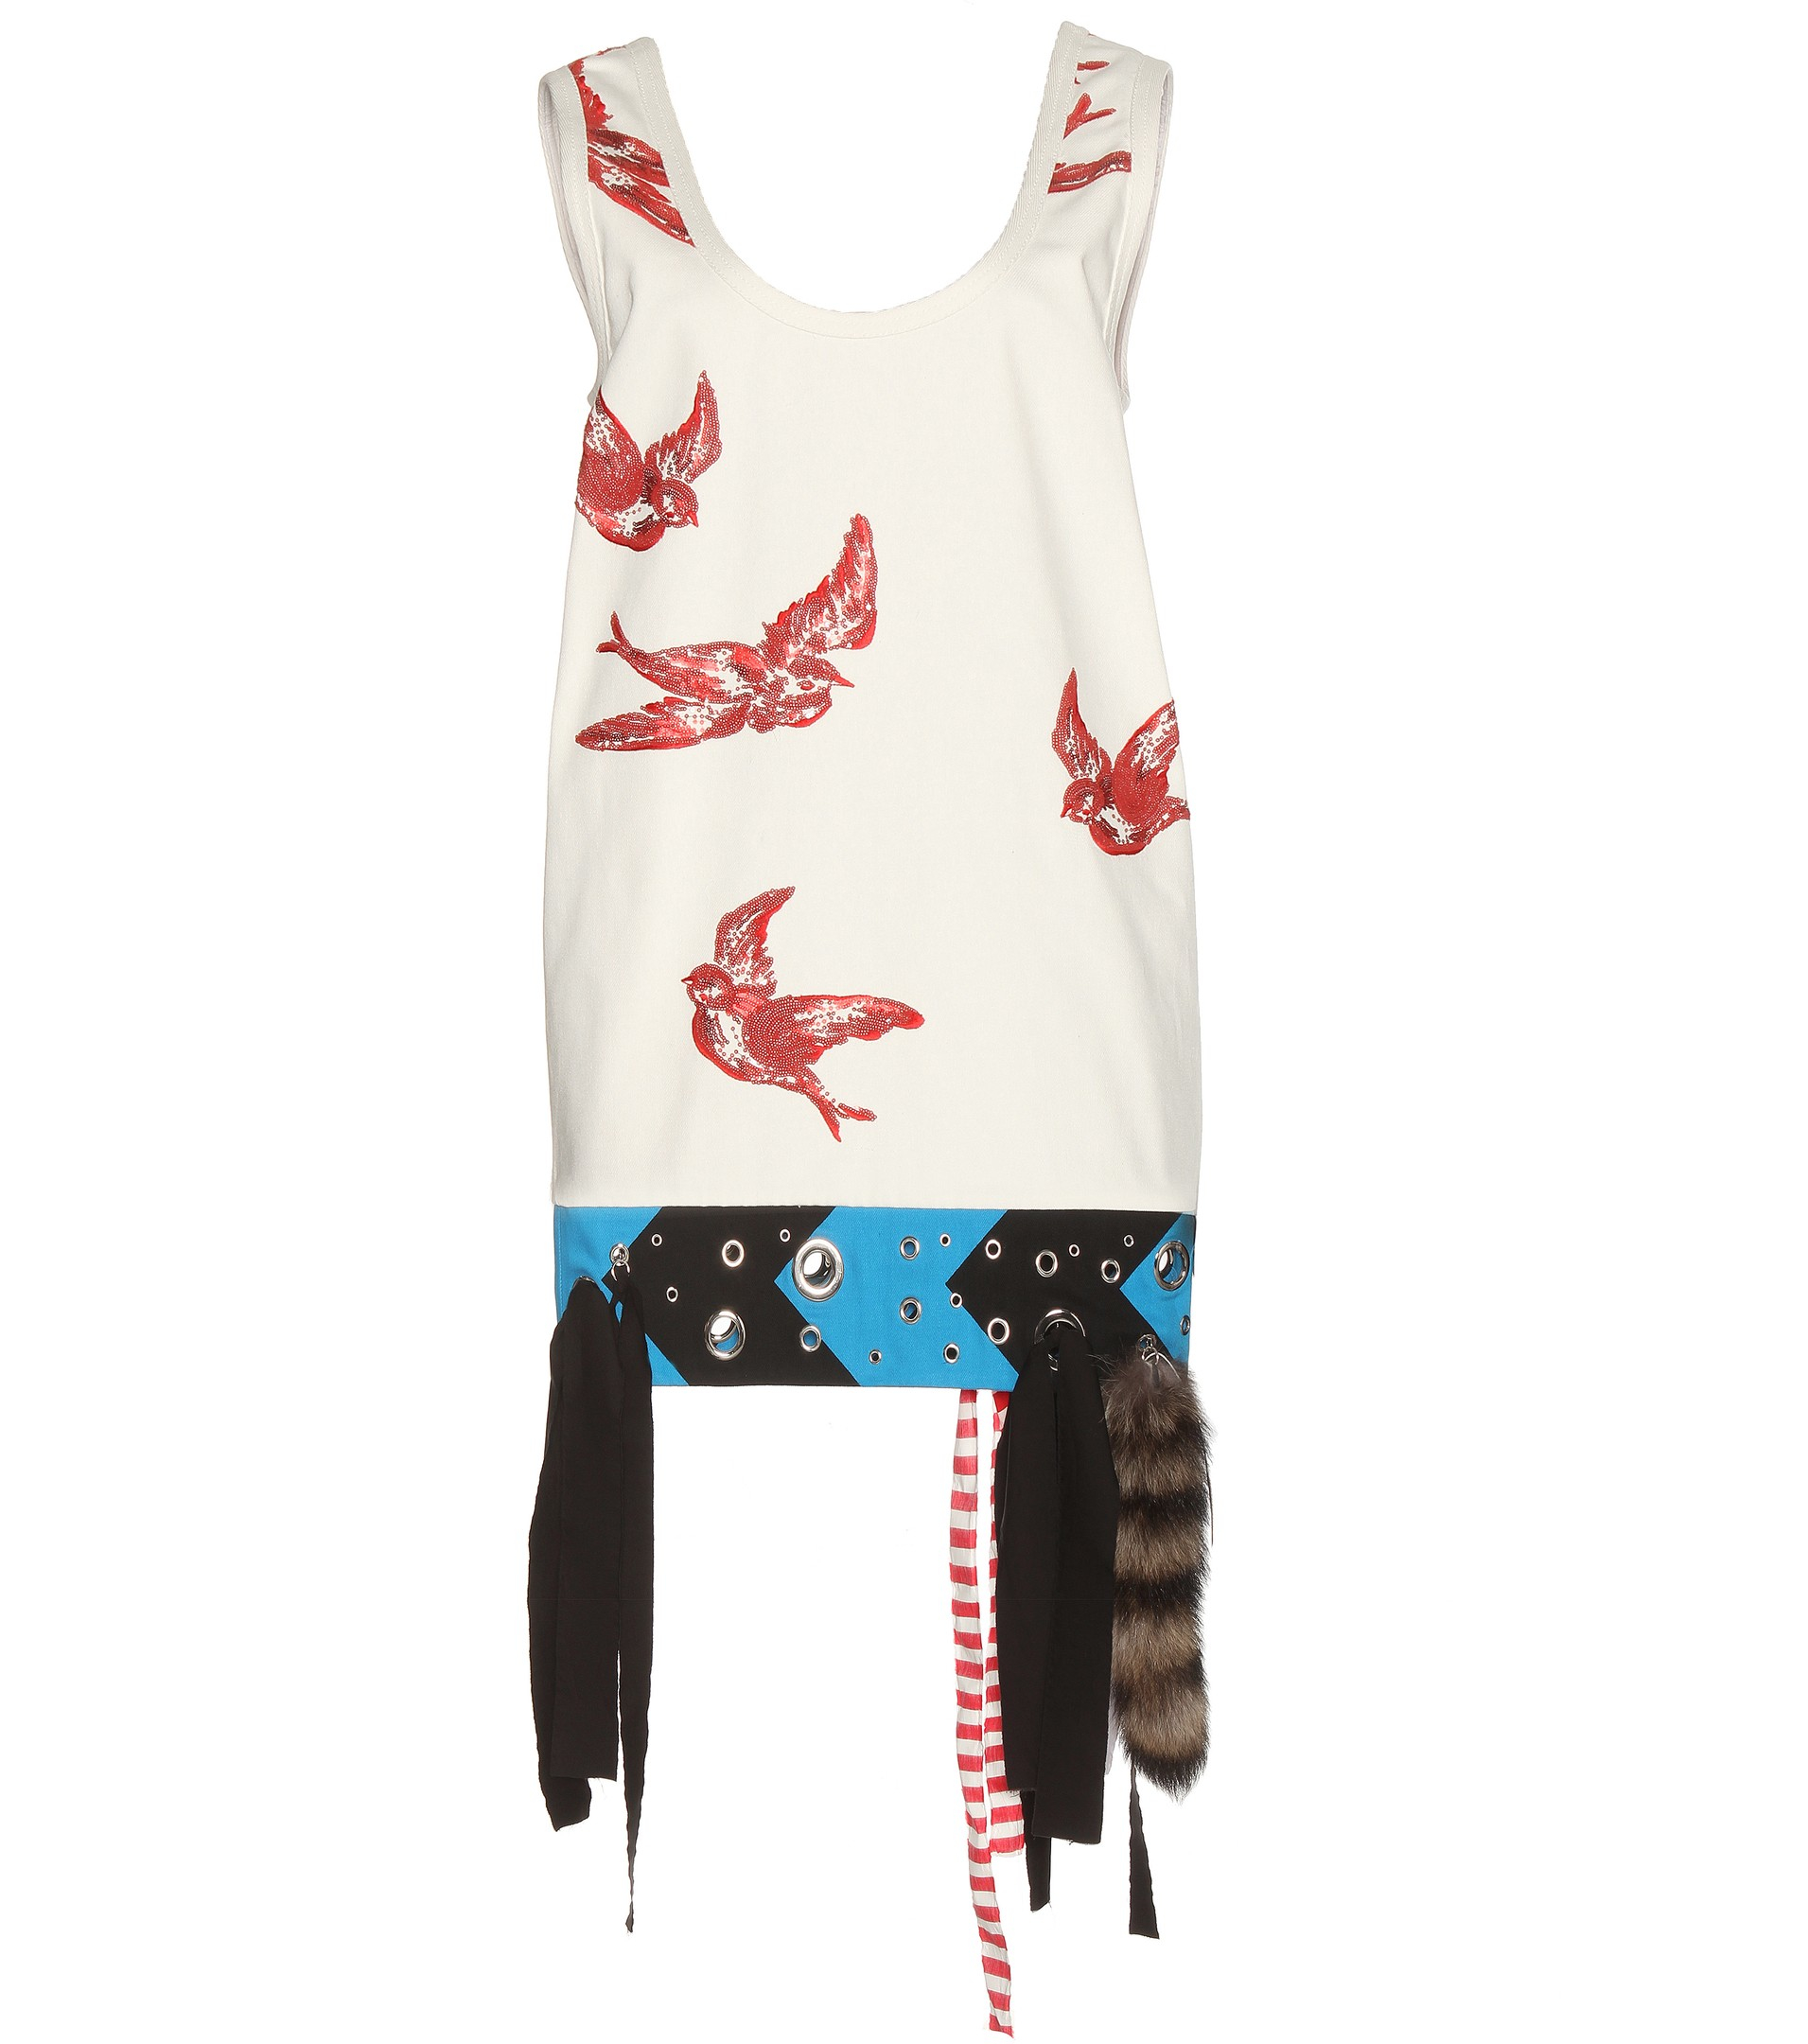 Embellished cotton dress Miu Miu Clearance Top Quality t5fYlyI